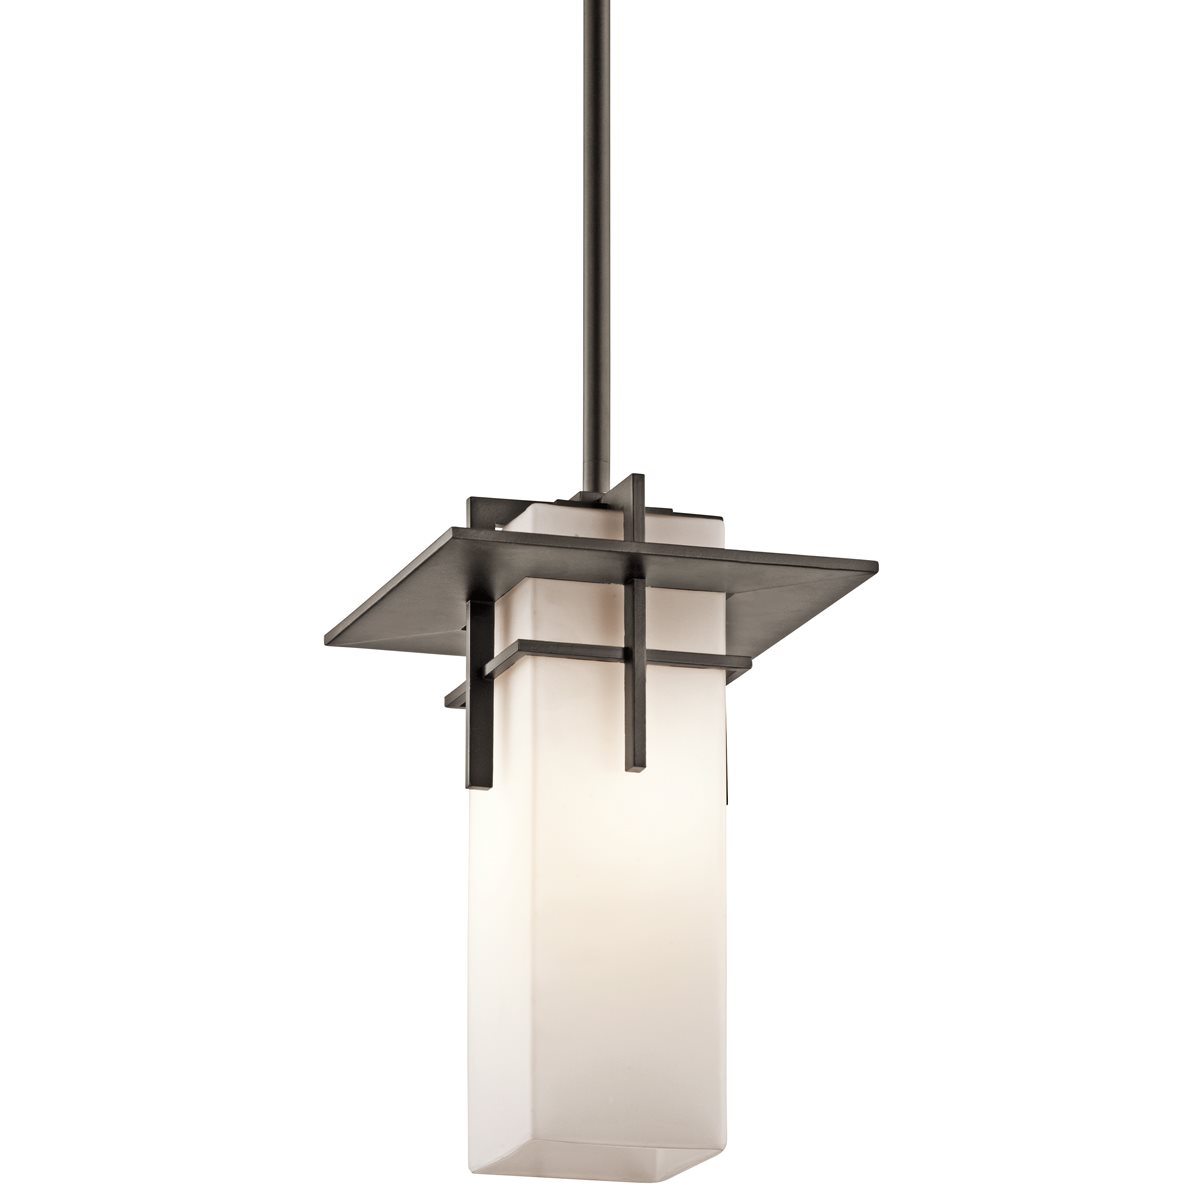 Kichler Lighting 49645OZ Caterham Modern / Contemporary